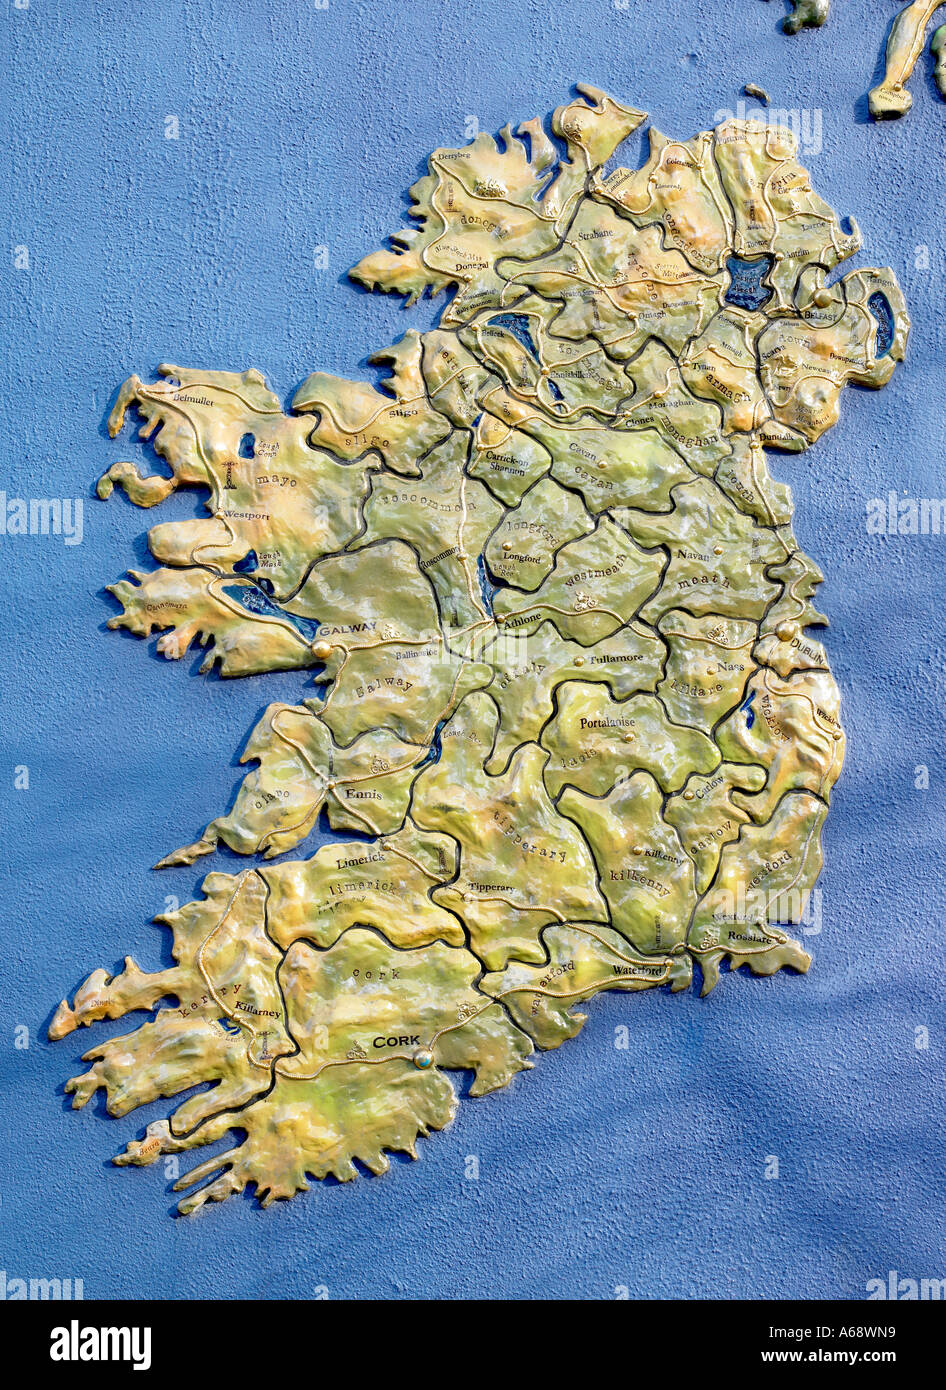 Map Of Ireland 3d.3d Map Of Ireland Stock Photos 3d Map Of Ireland Stock Images Alamy